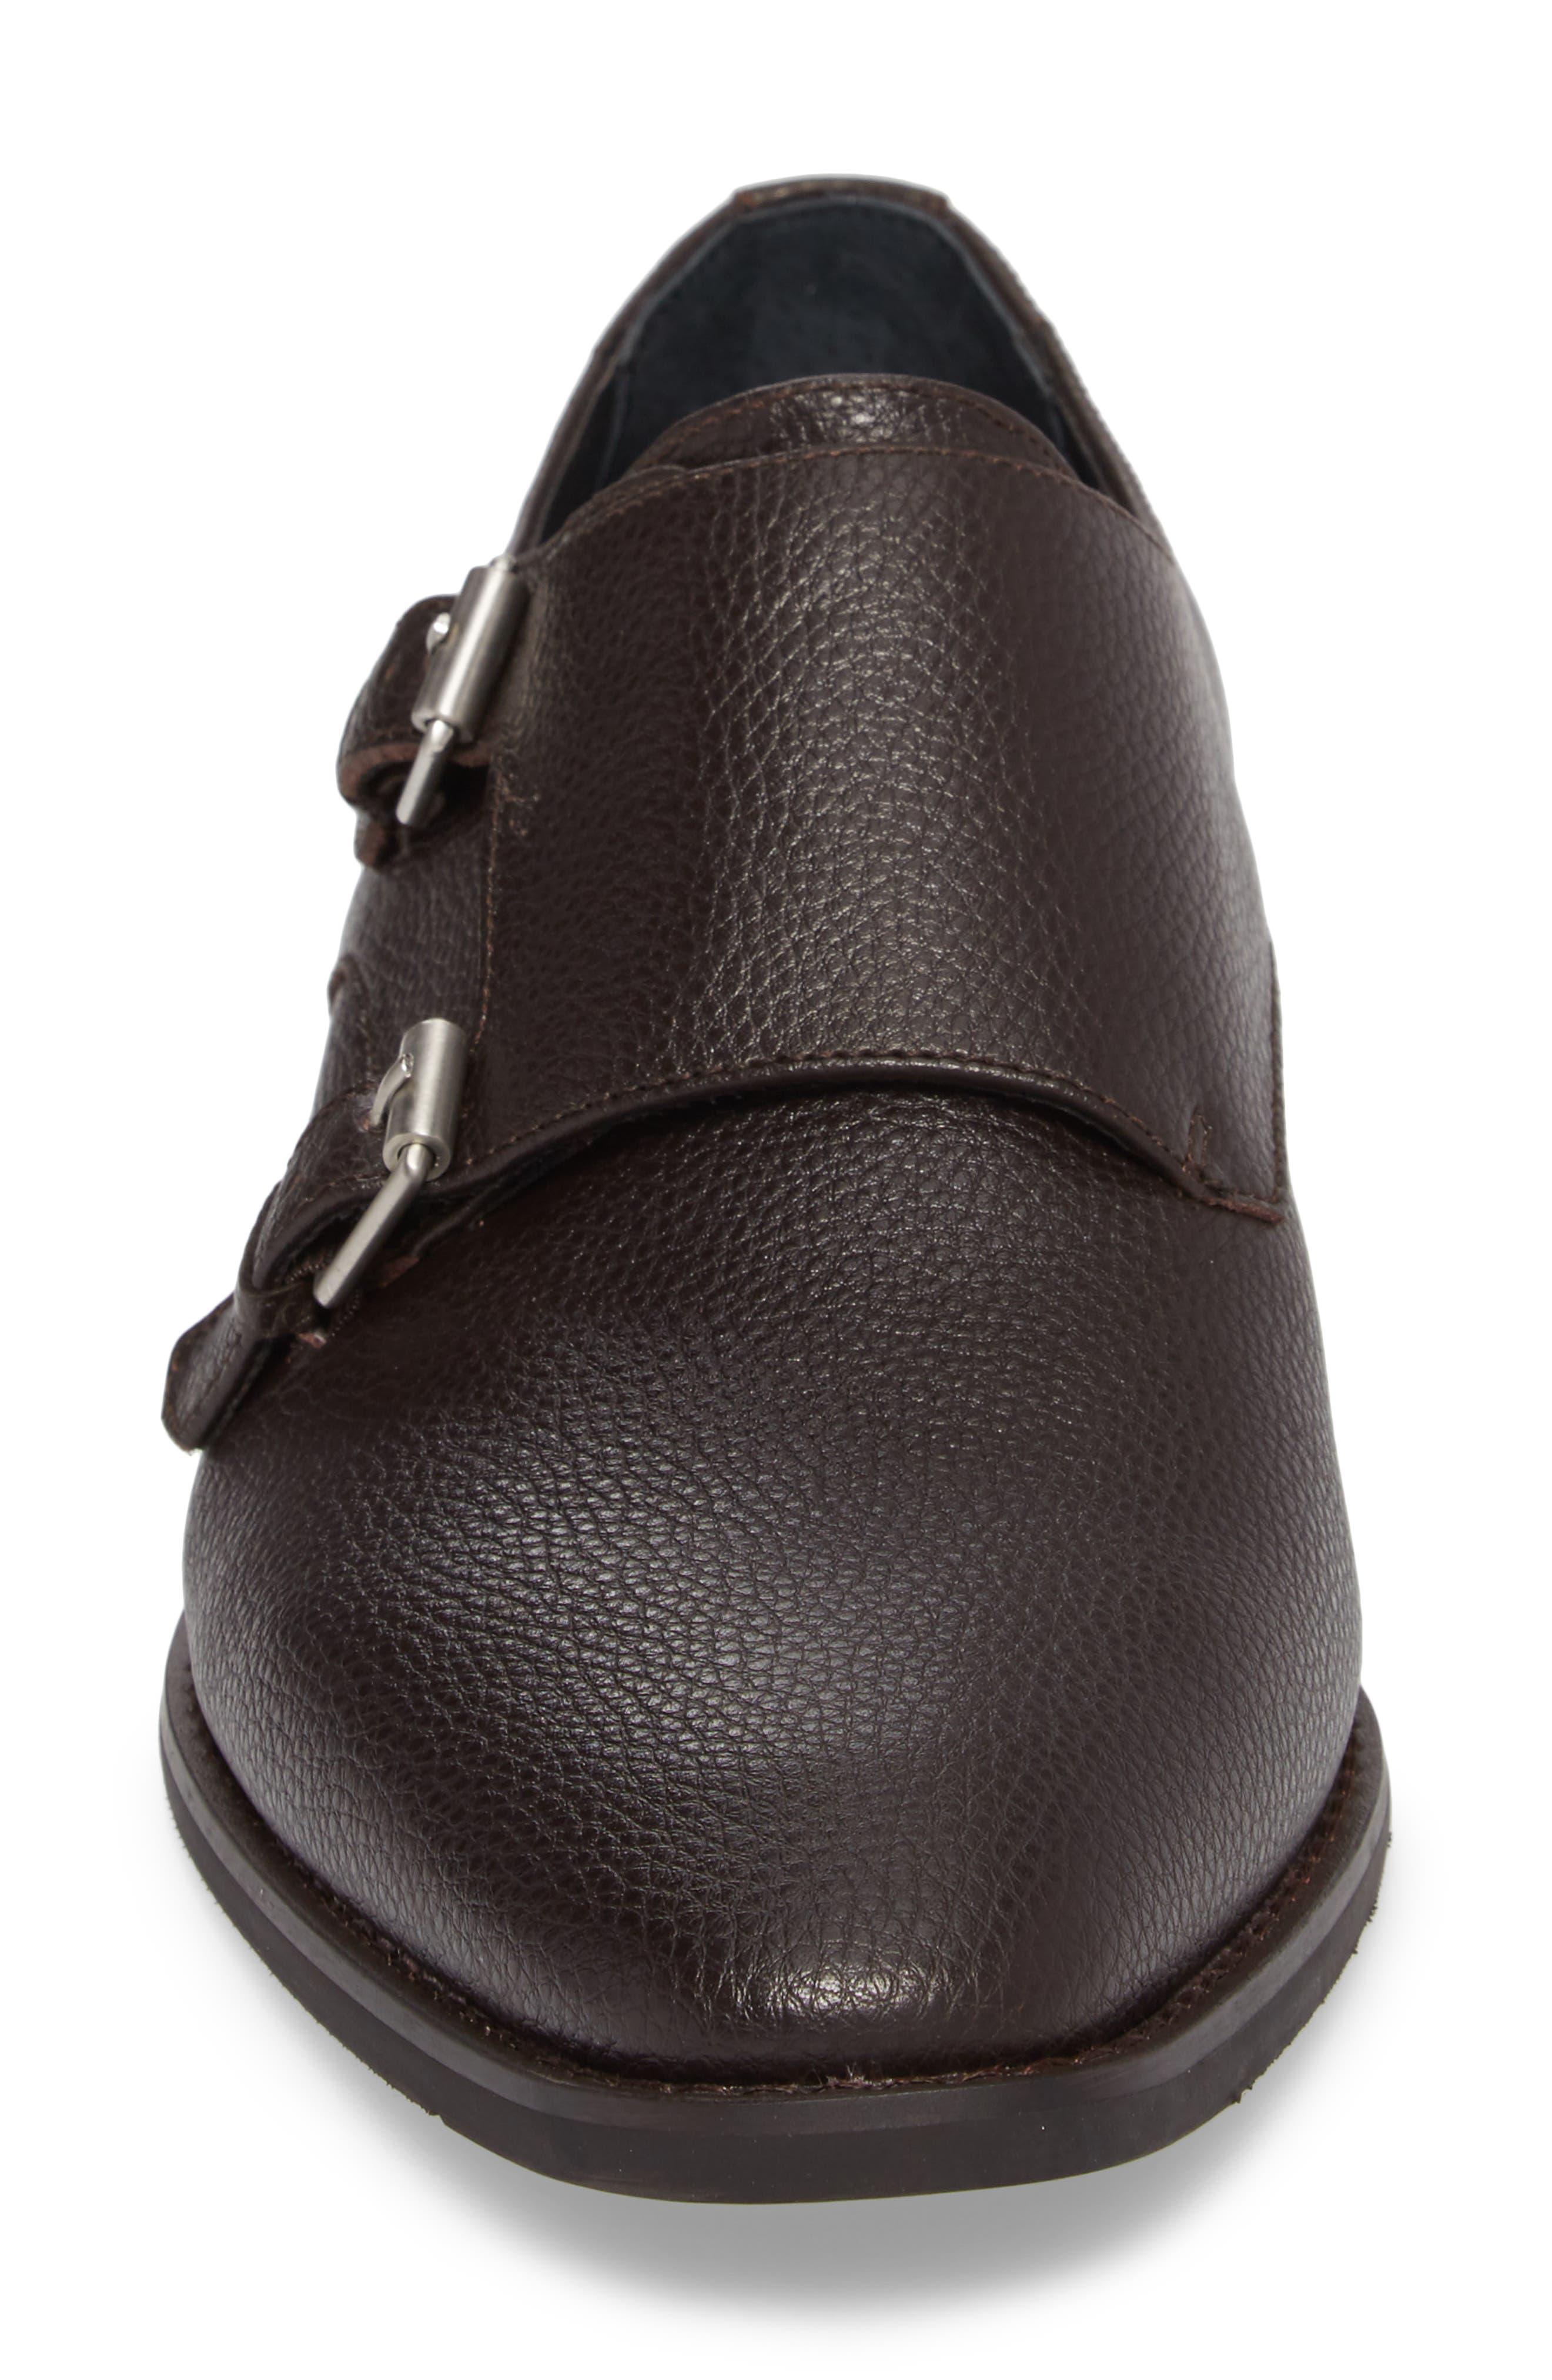 Robbie Double Monk Strap Shoe,                             Alternate thumbnail 4, color,                             Dark Brown Leather